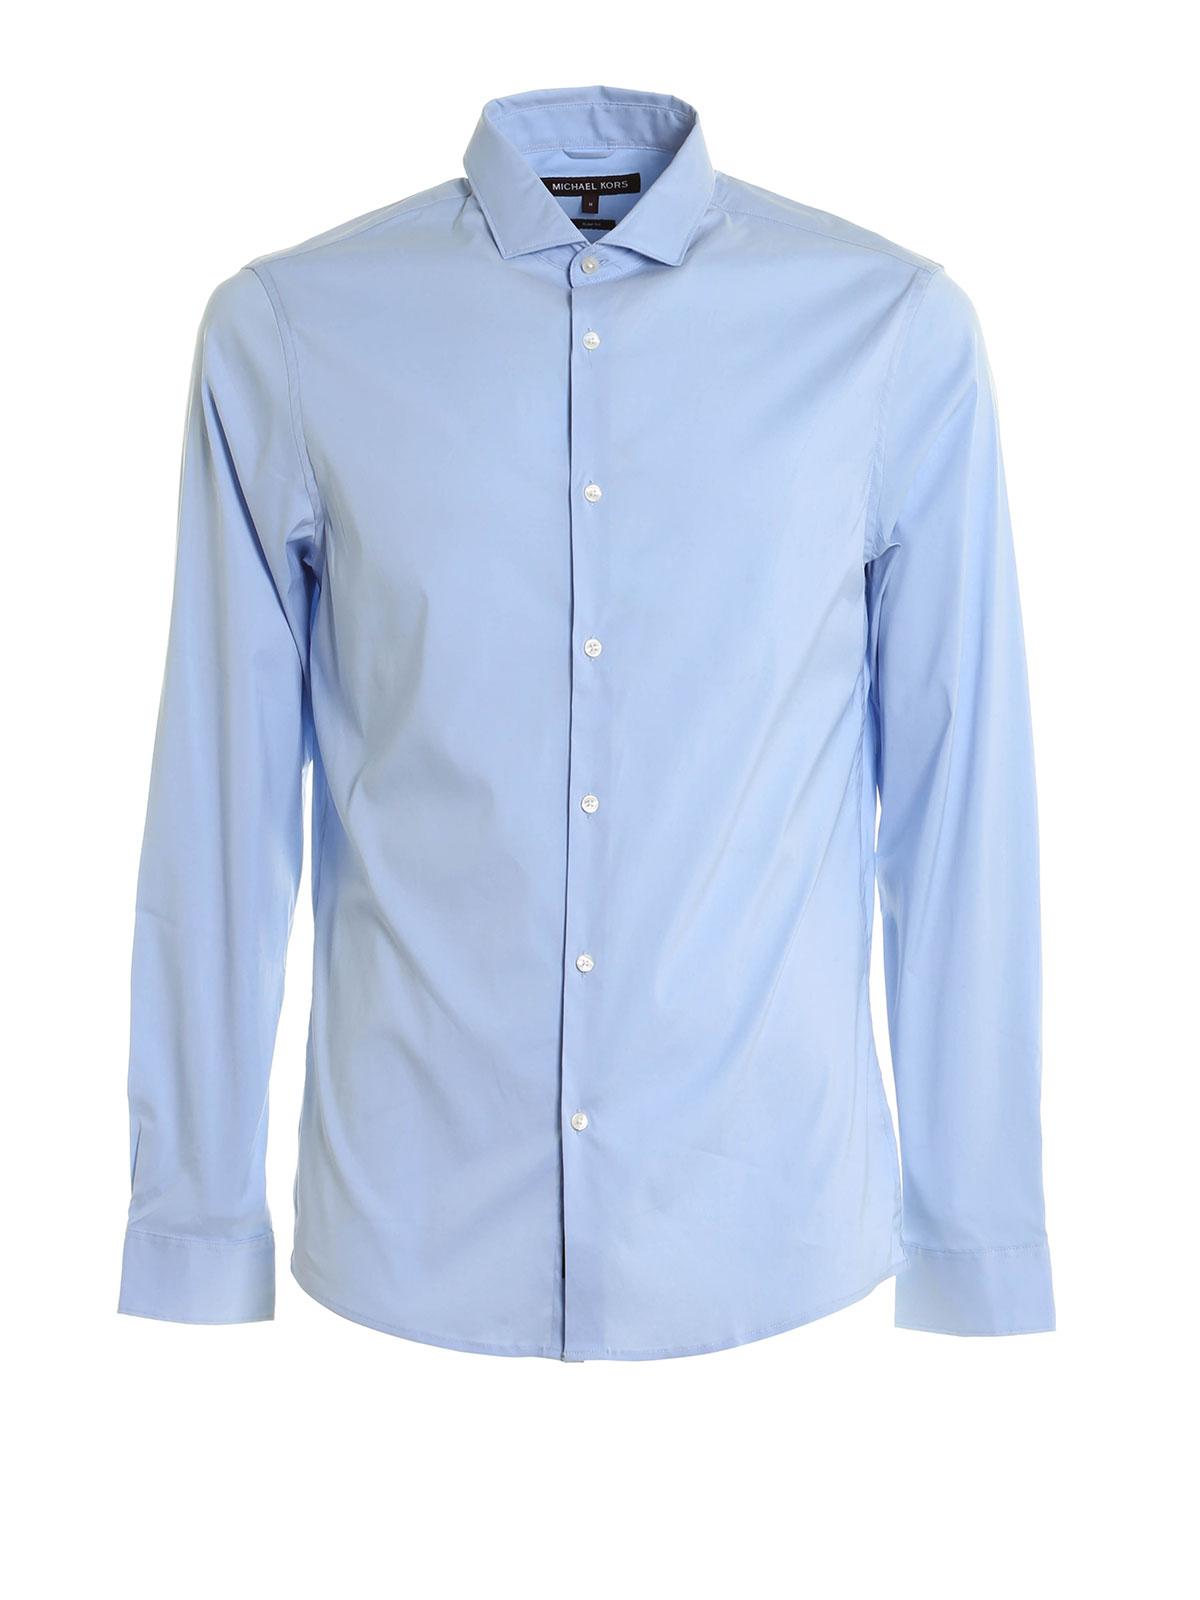 Slim fit cotton blend shirt by michael kors shirts for Slim fit cotton shirts